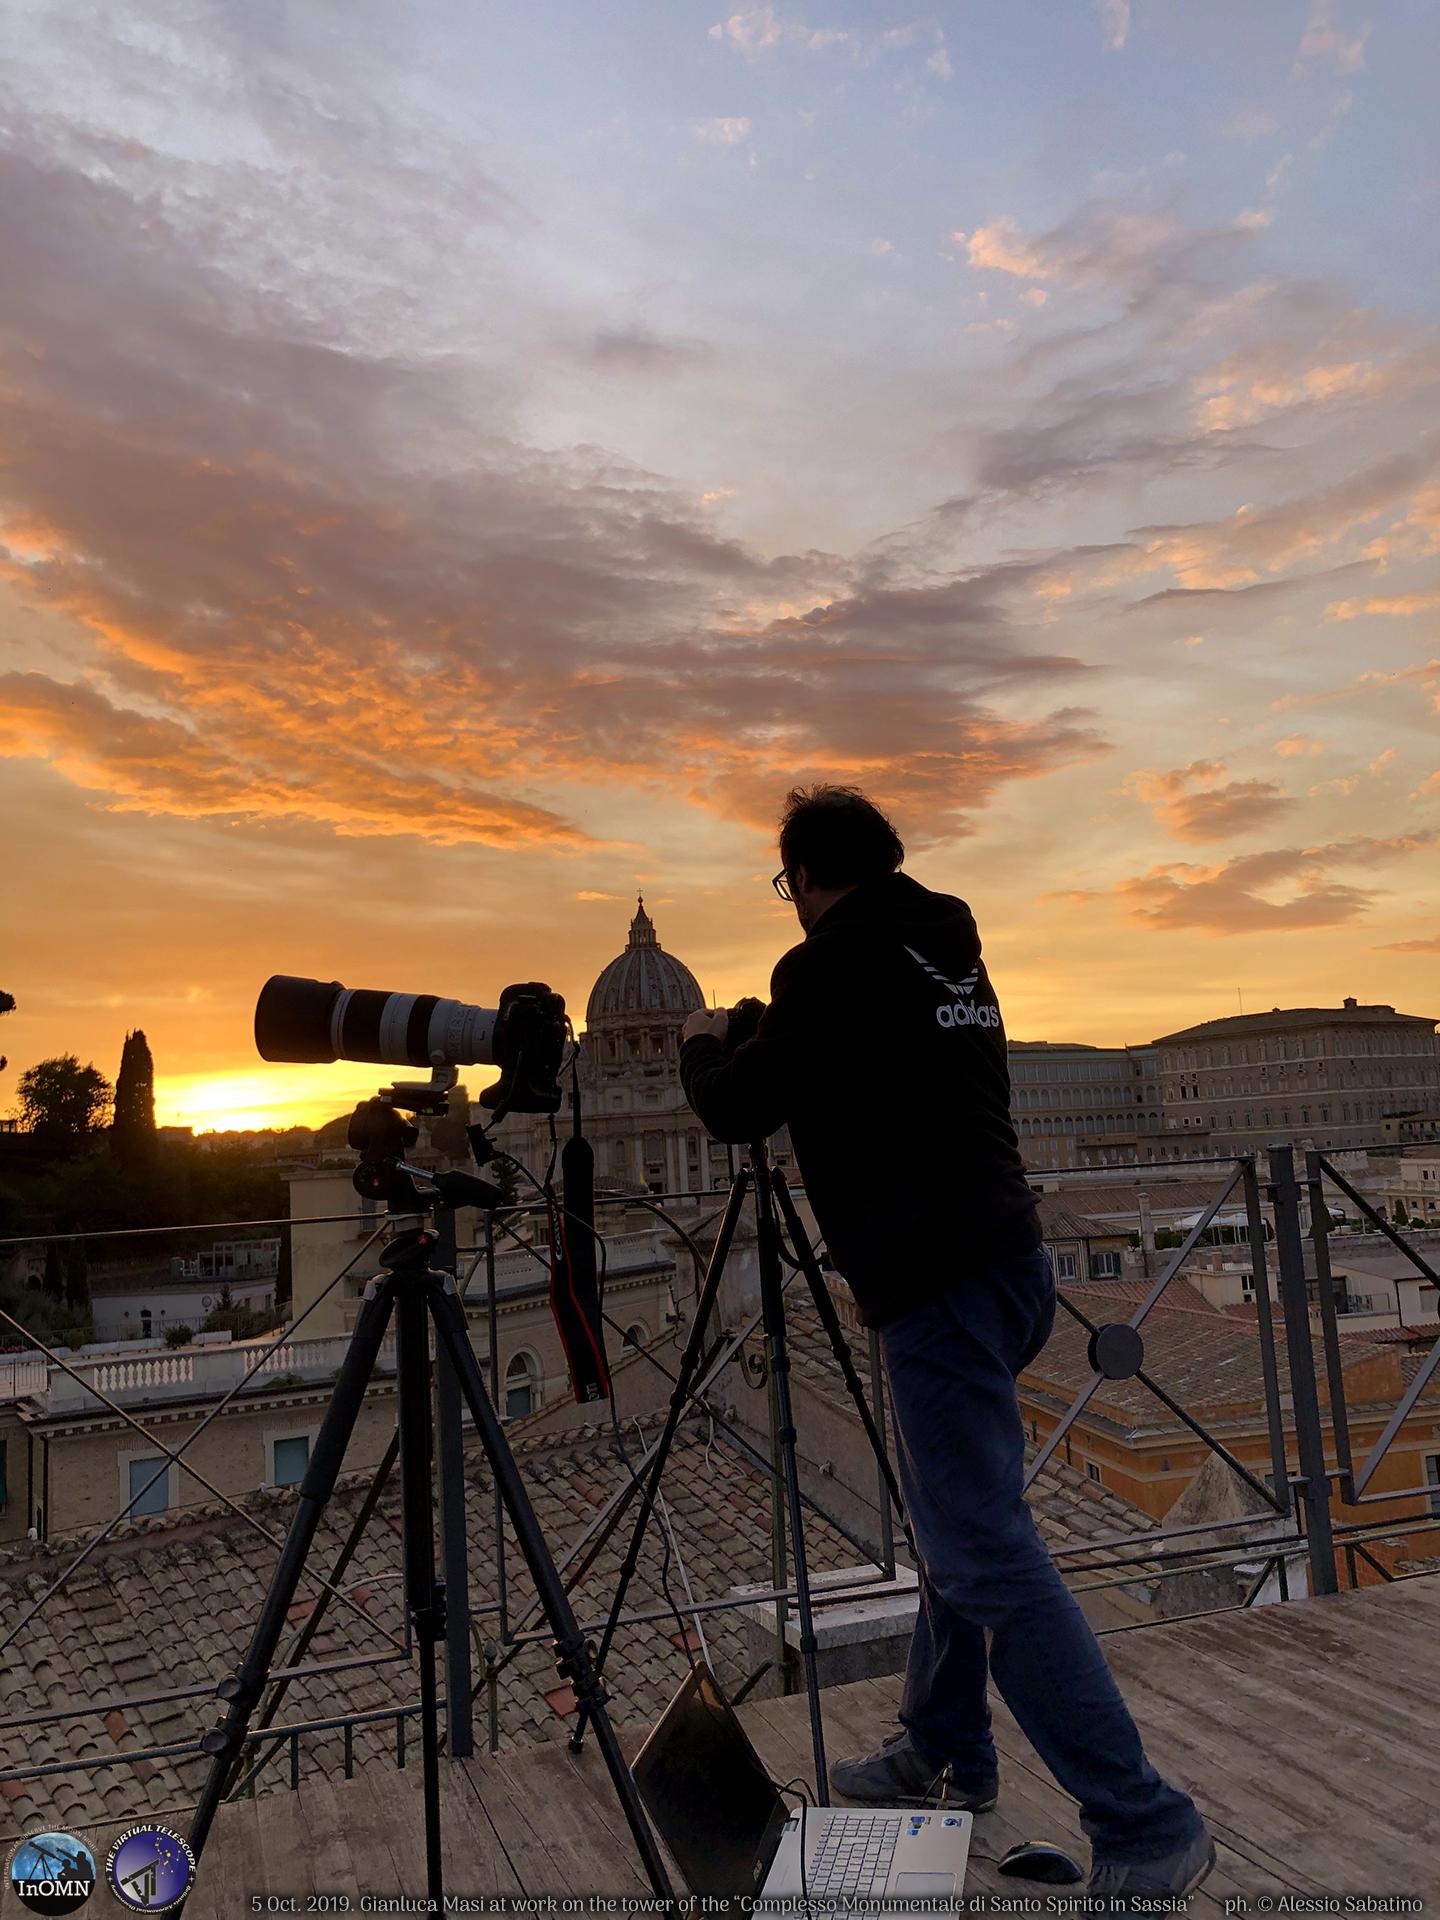 Gianluca Masi is setting up his cameras. Ph. Alessio Sabatino